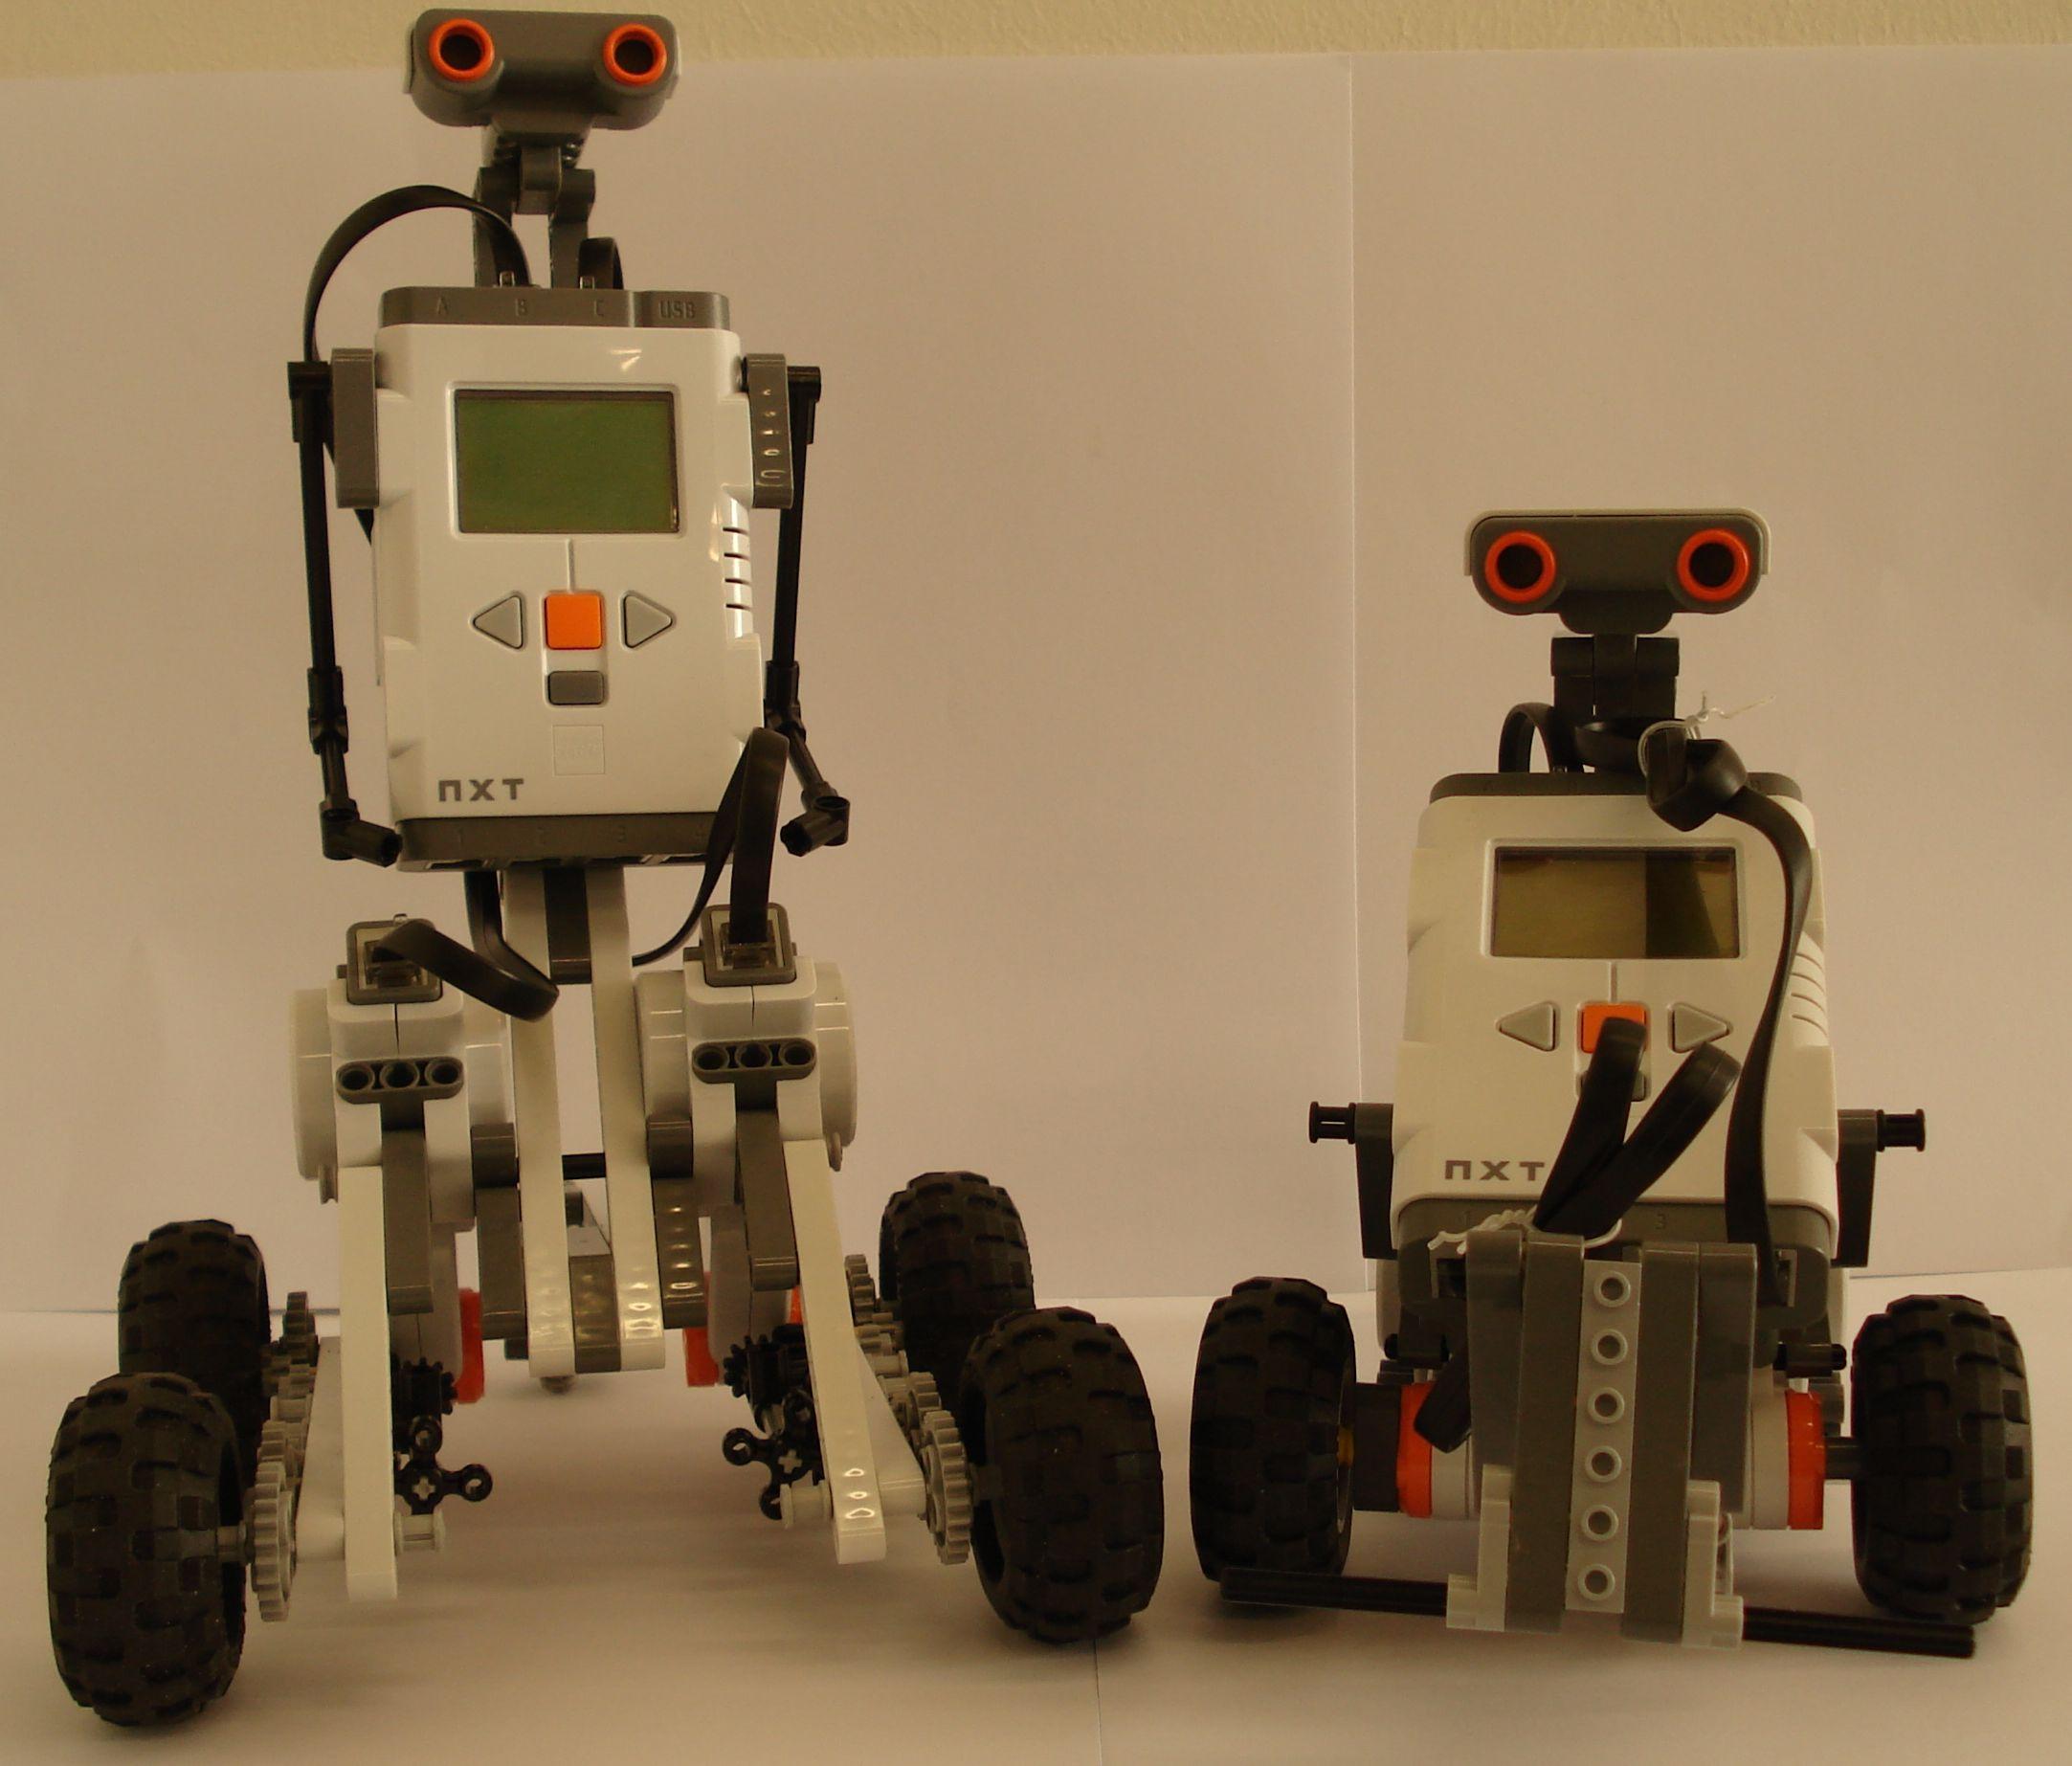 ROILA, a New Spoken Language Designed for Robots